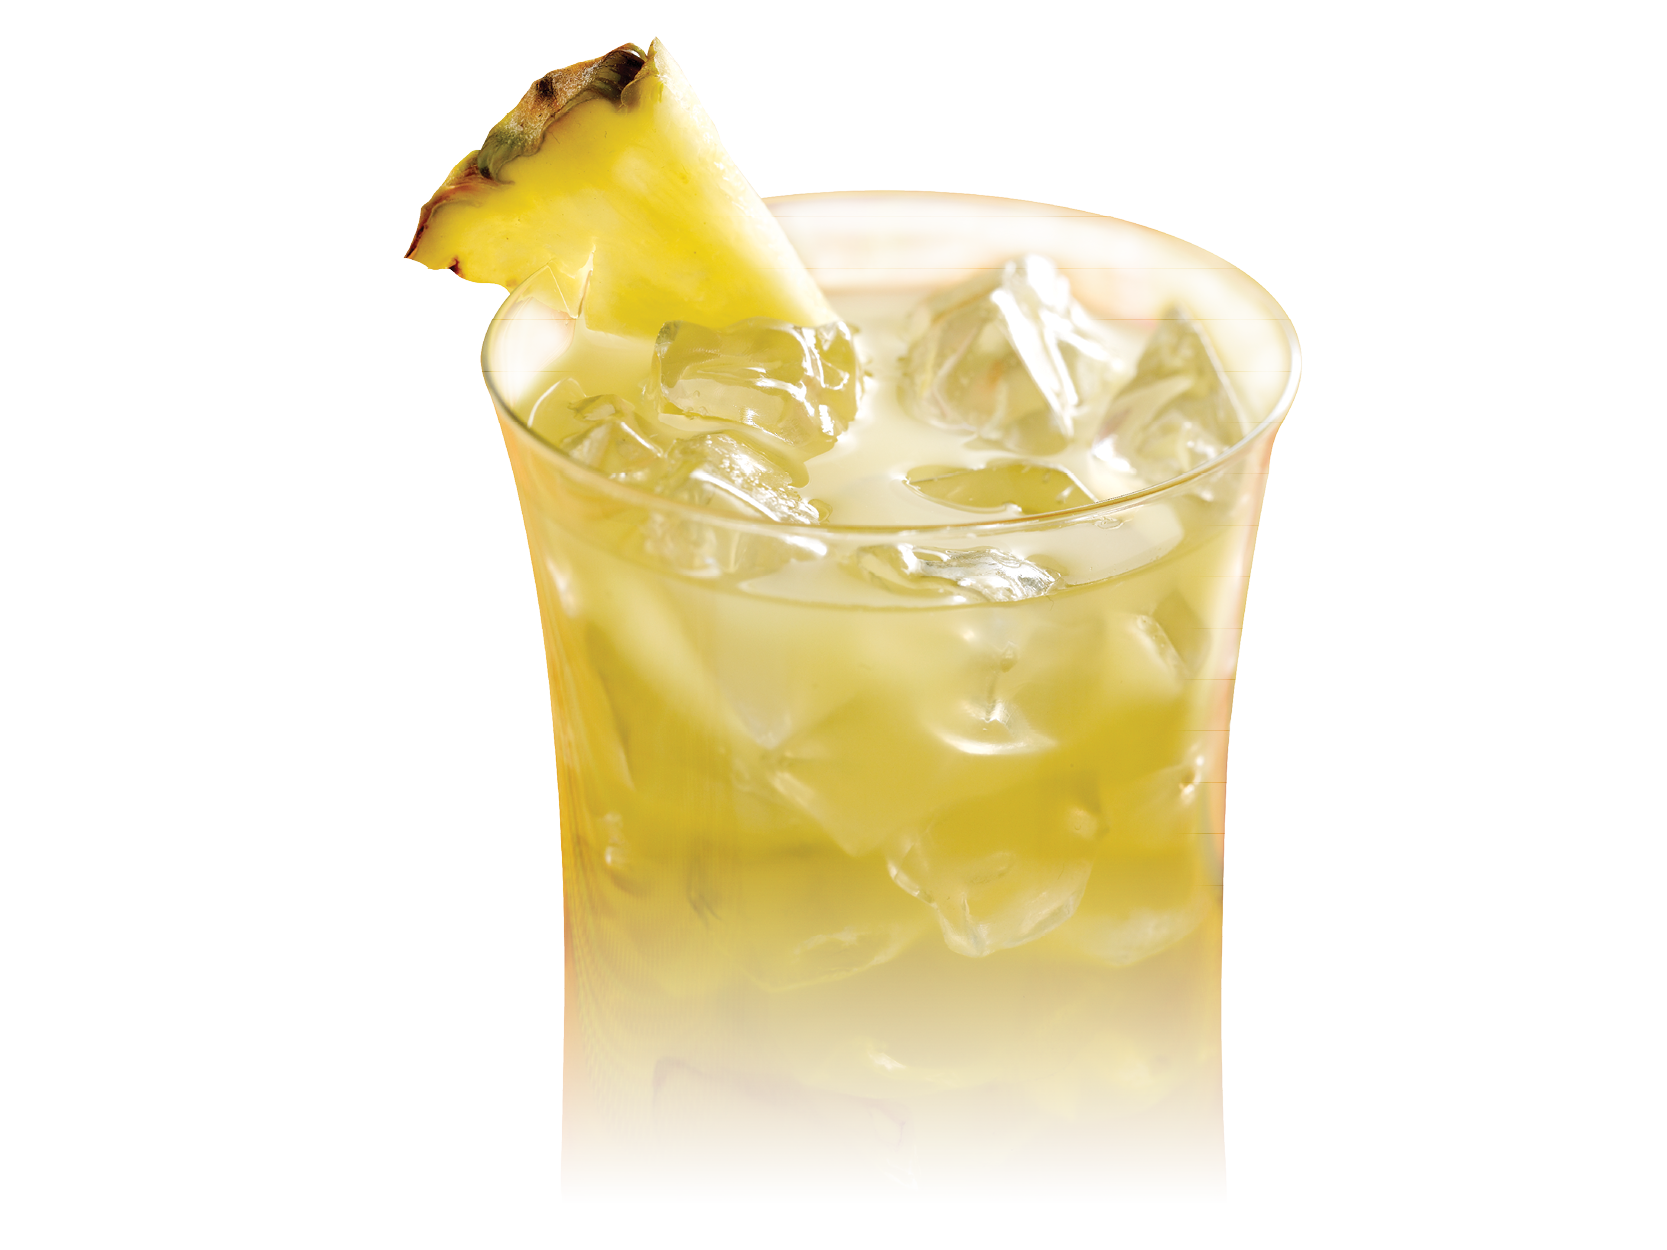 32862 dole pineapple juice hero isgccu